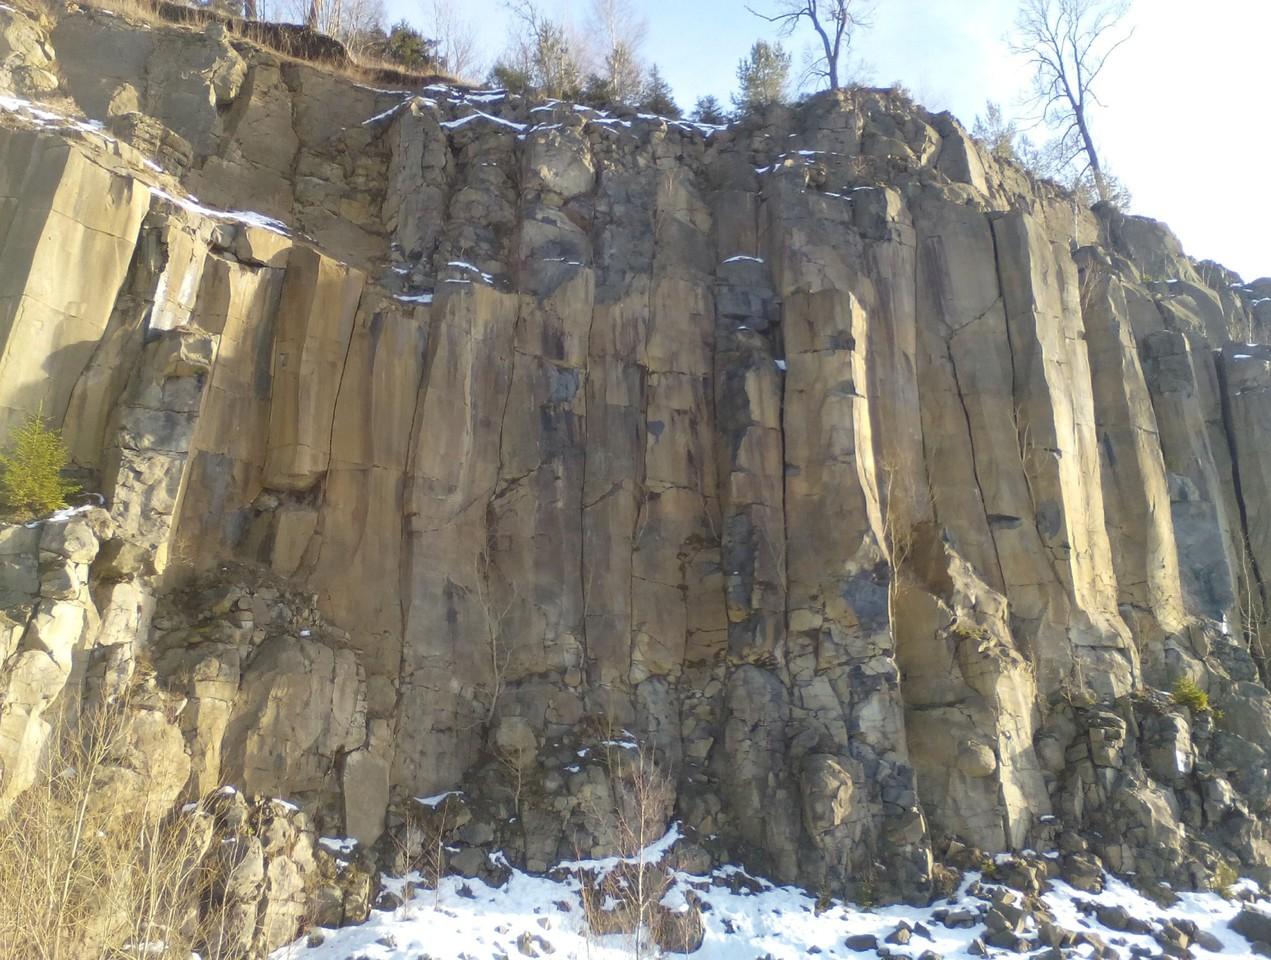 Klettersteig Quarzit Wand : Burgfelsen neuhaus u2013 dav karlsbad